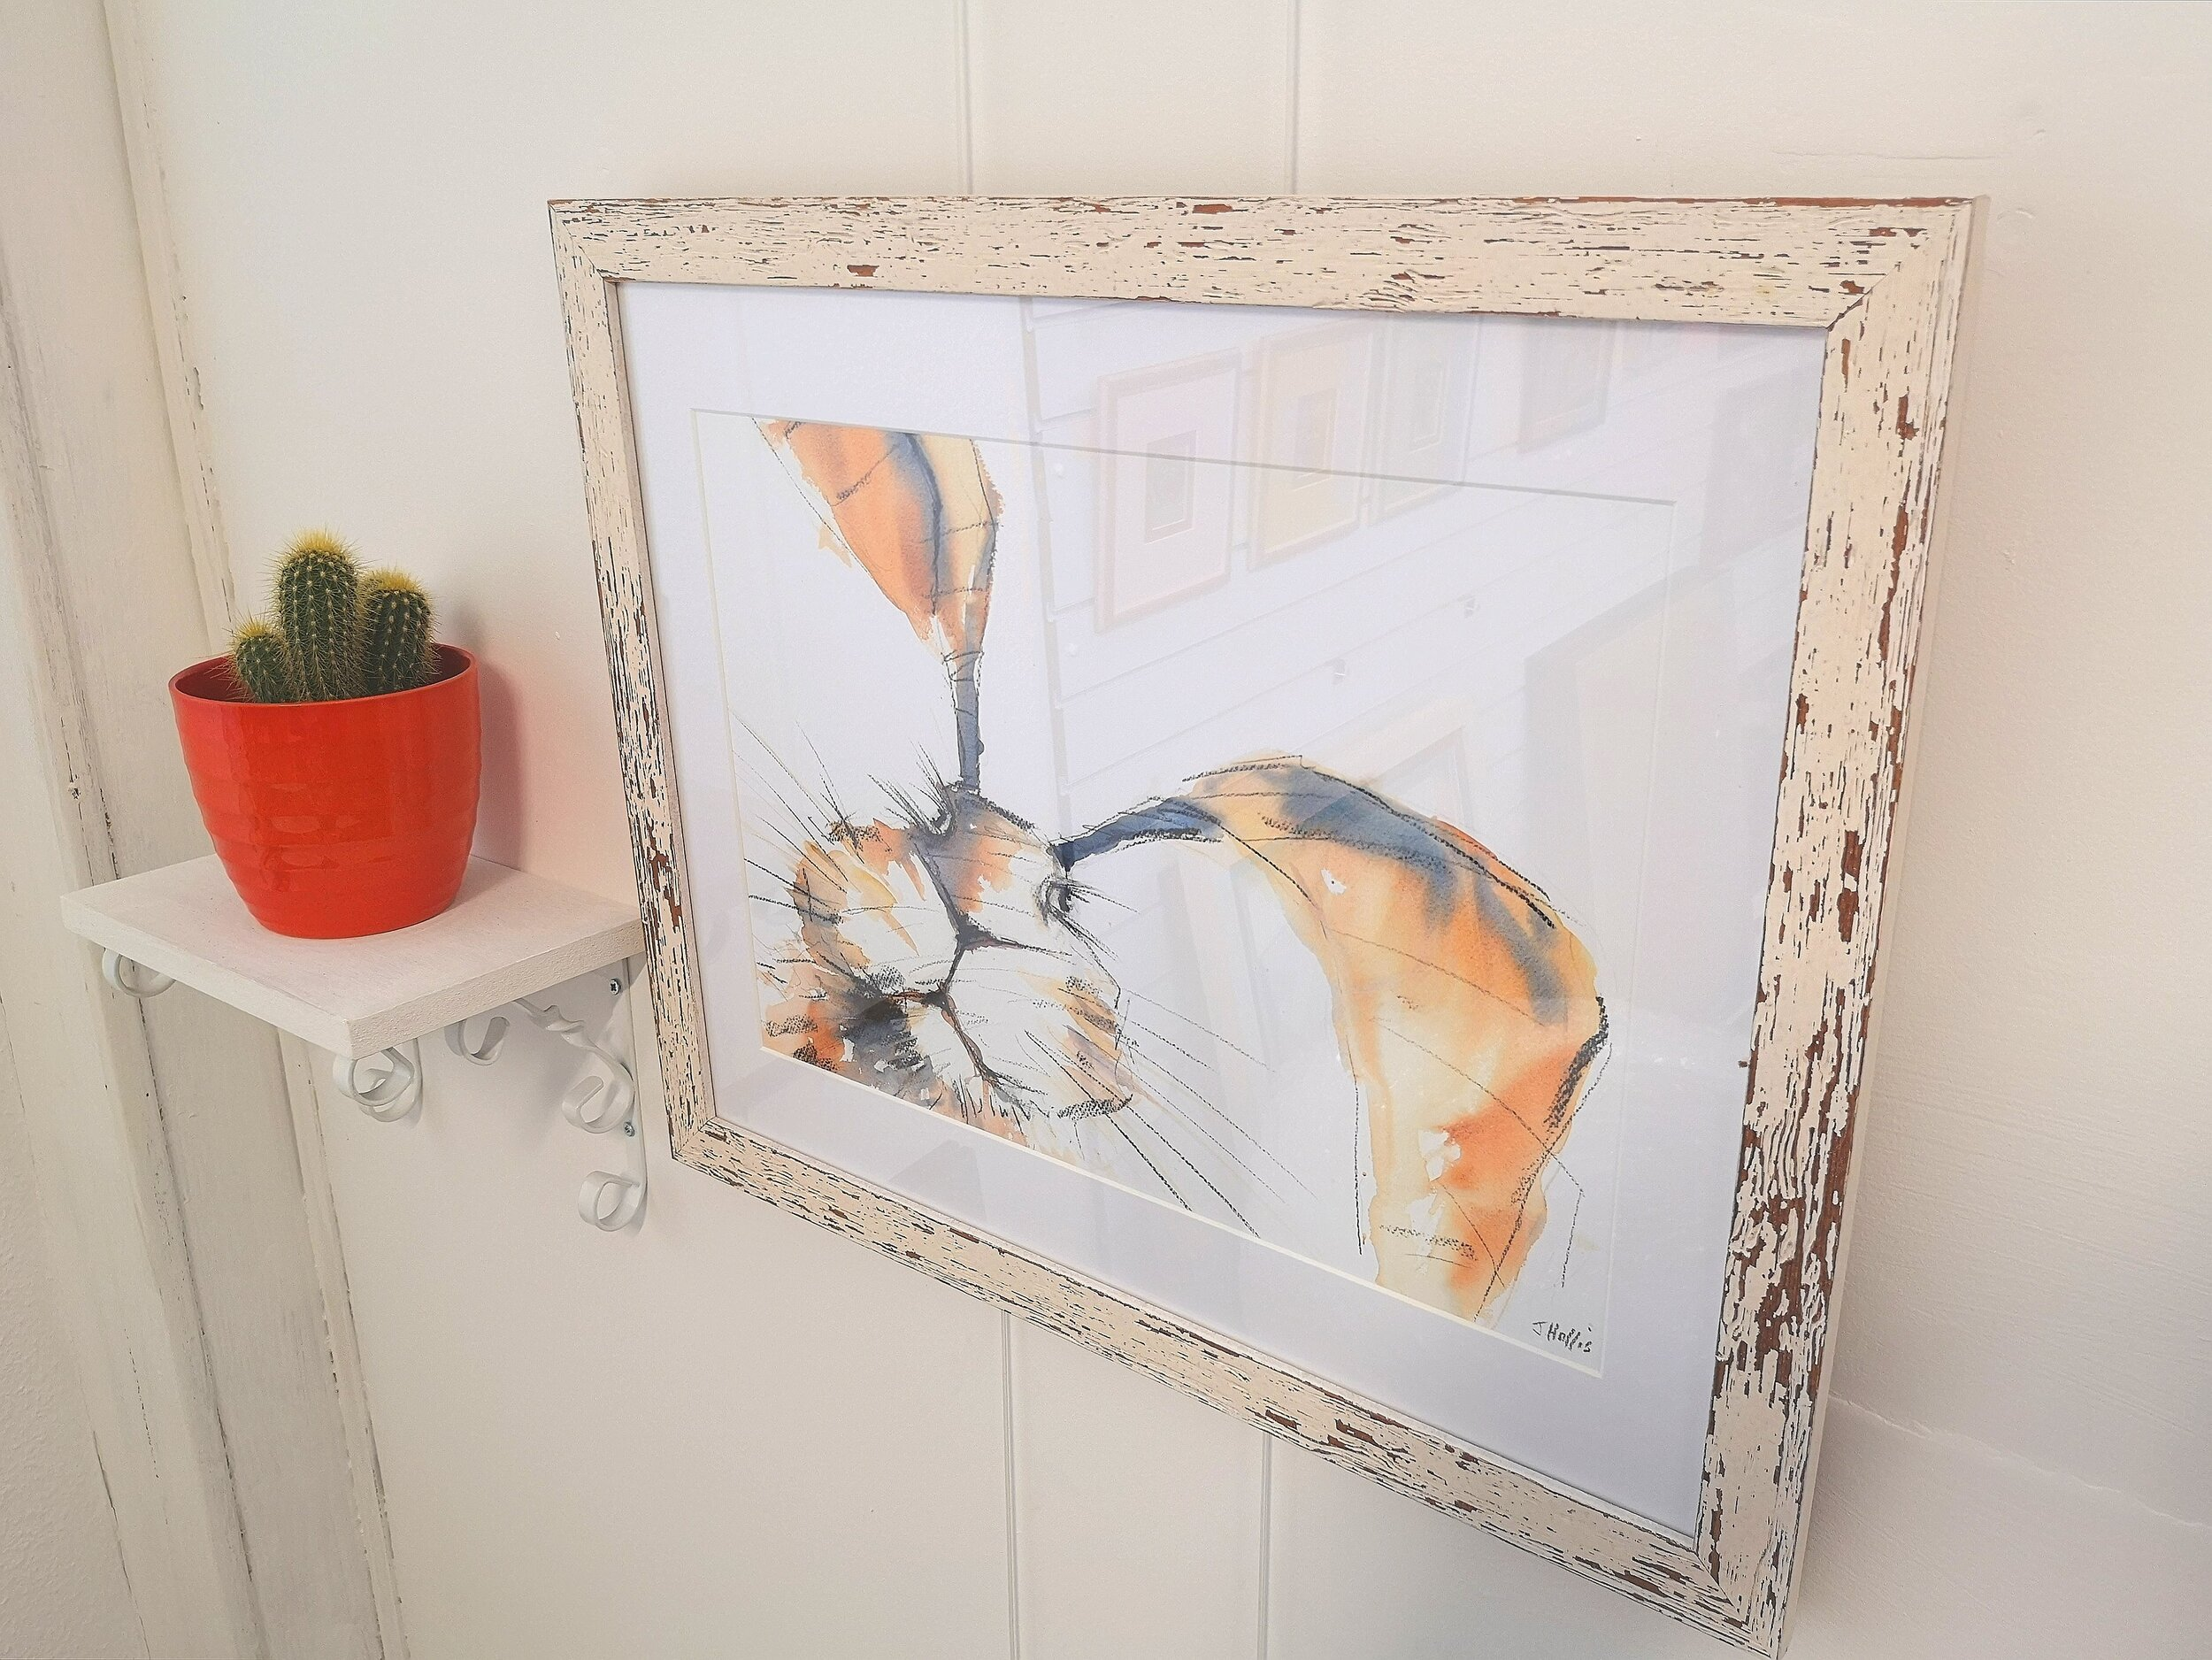 frames-rabbit-watercolour.jpg